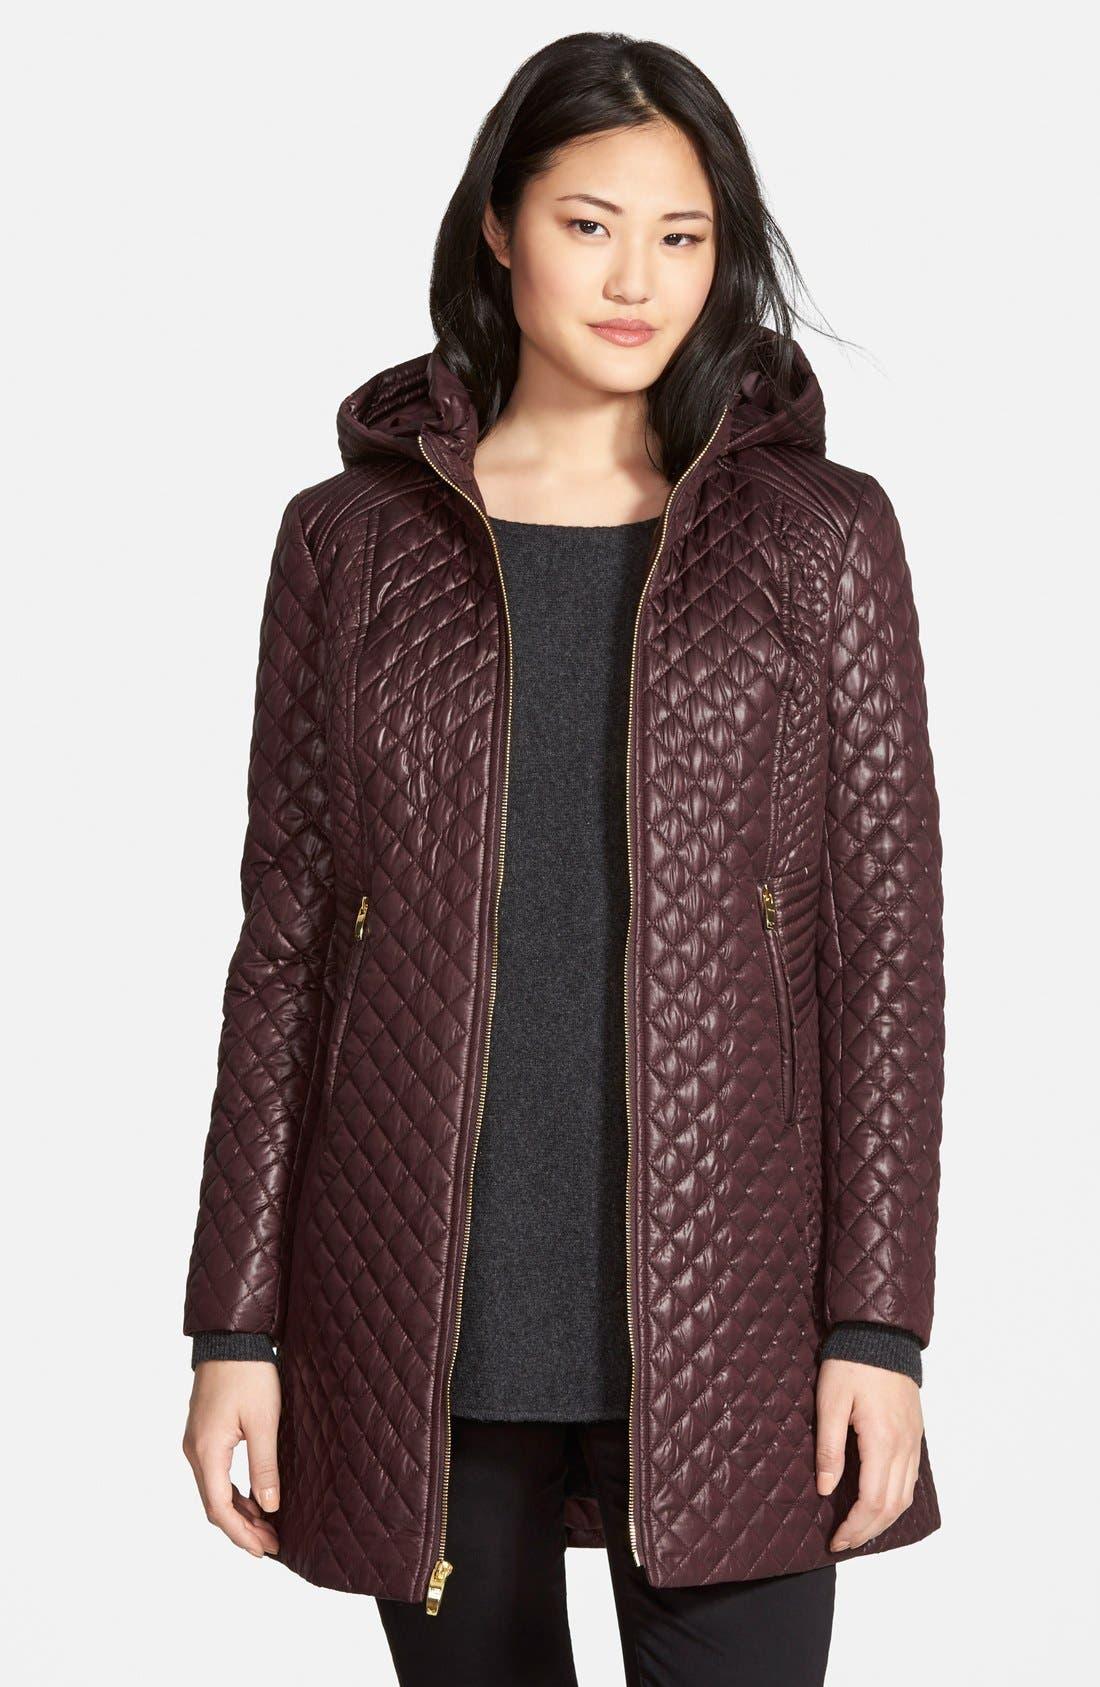 Alternate Image 1 Selected - Via Spiga Hooded Front Zip Quilted Coat (Regular & Petite)